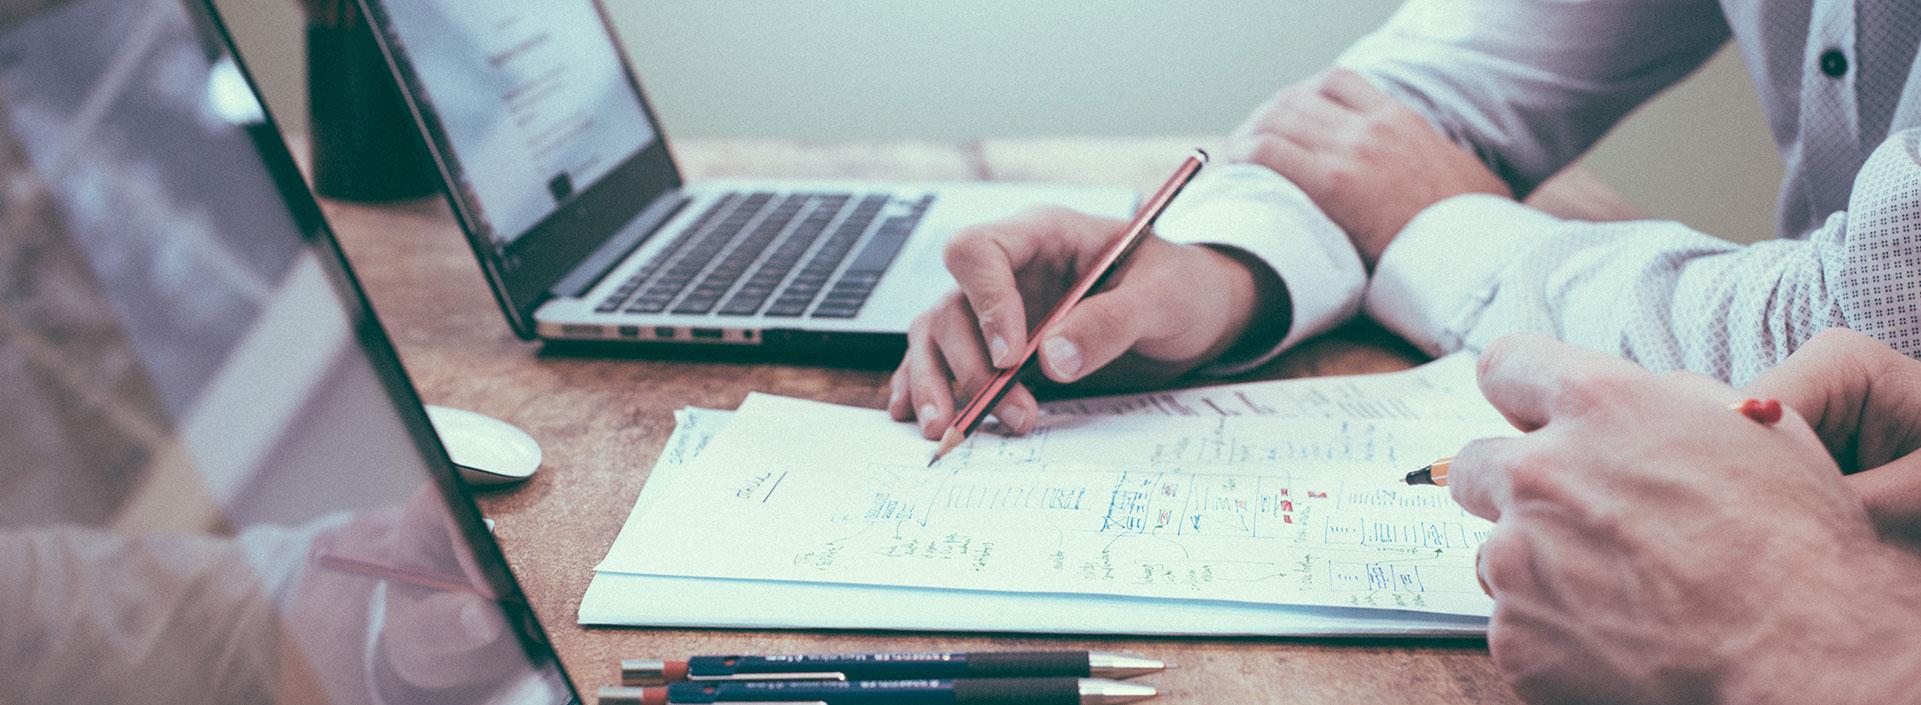 Teaching your staff personal finance skills